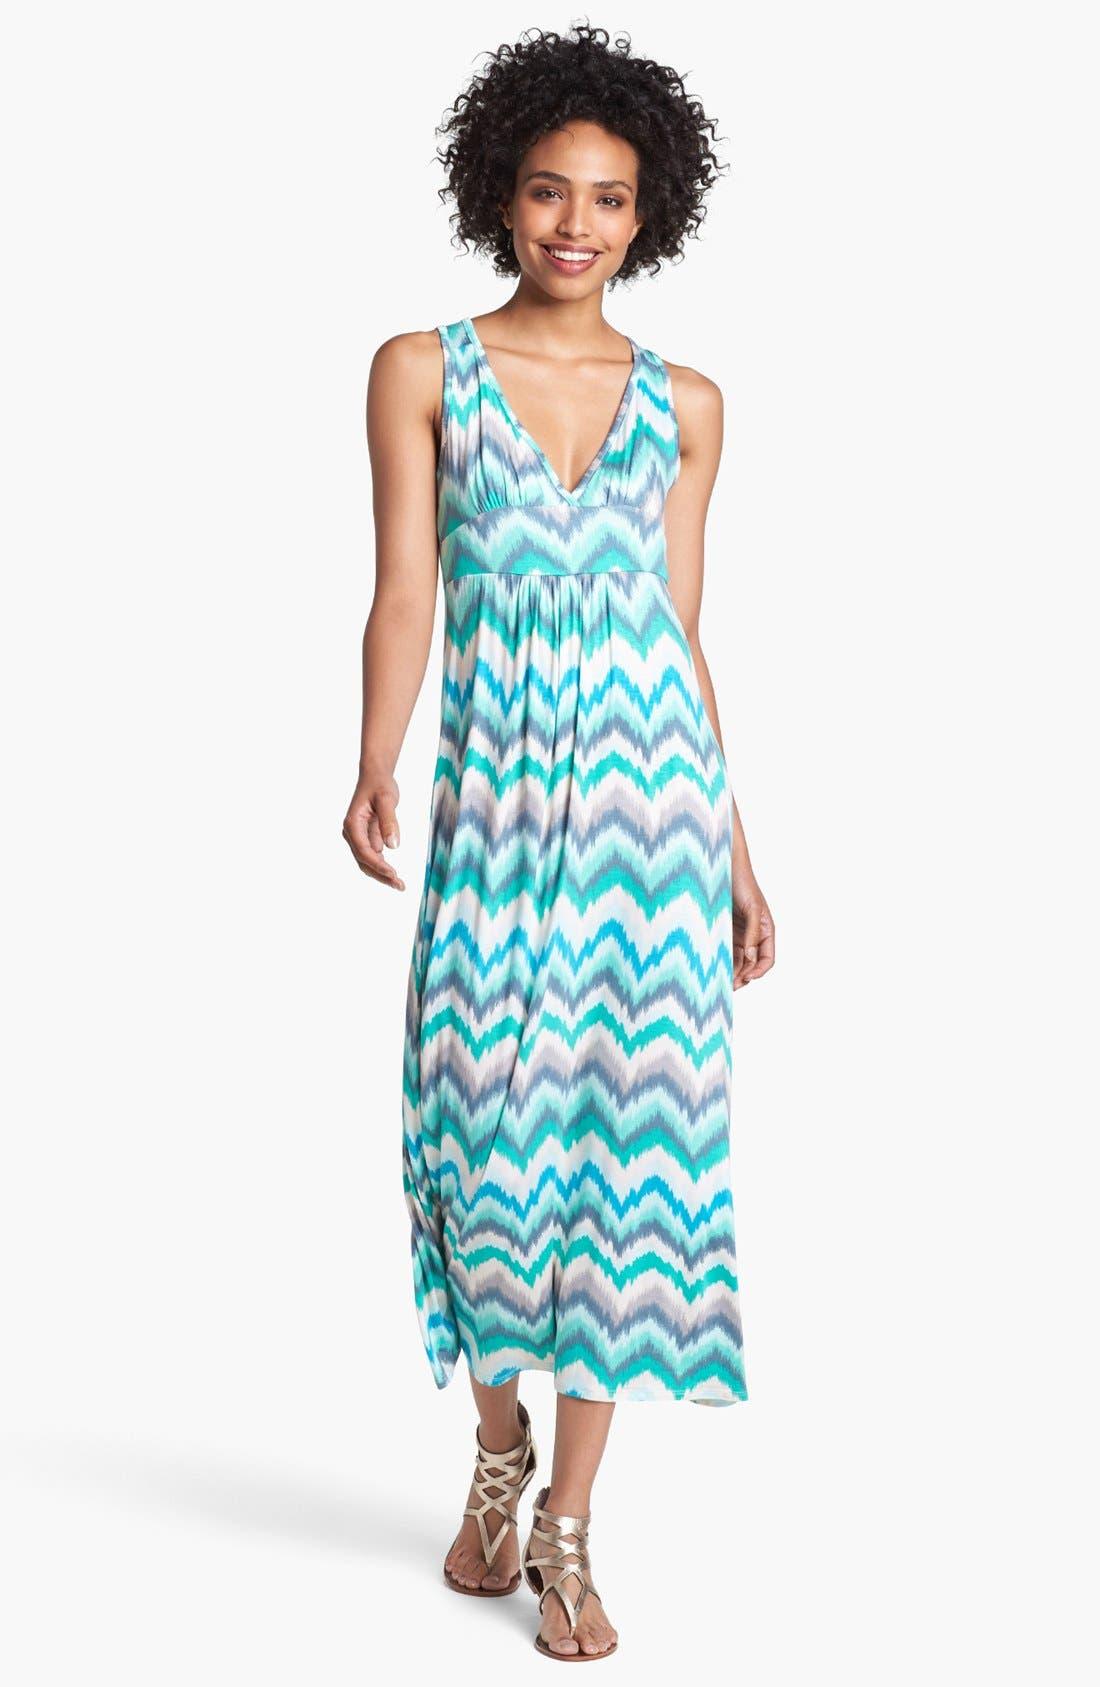 Alternate Image 1 Selected - Loveappella Zigzag Stripe Maxi Dress (Petite)